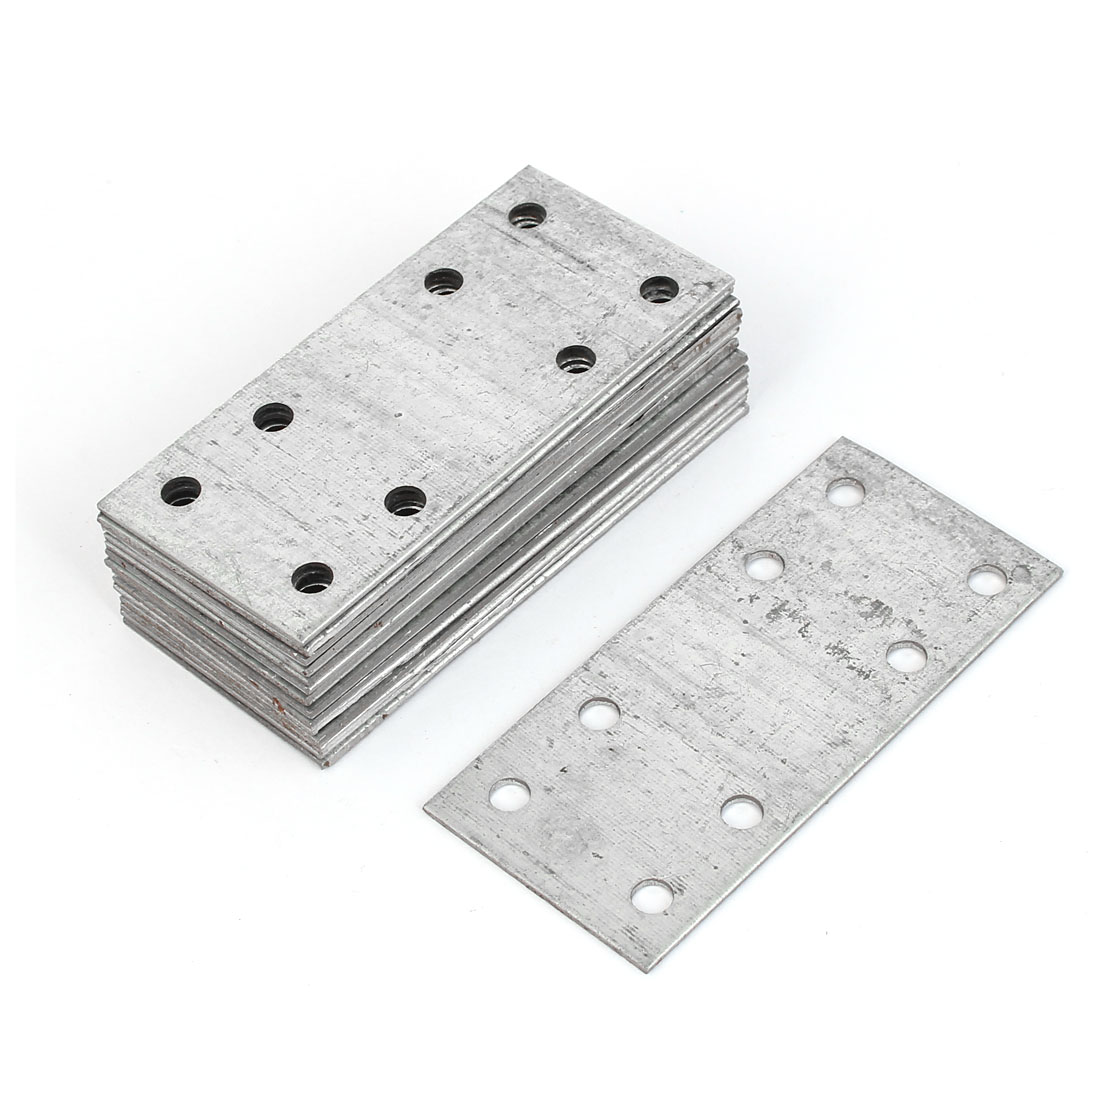 80mmx37mm Stainless Steel Flat Corner Straight Repair Plate Bracket 15 Pcs